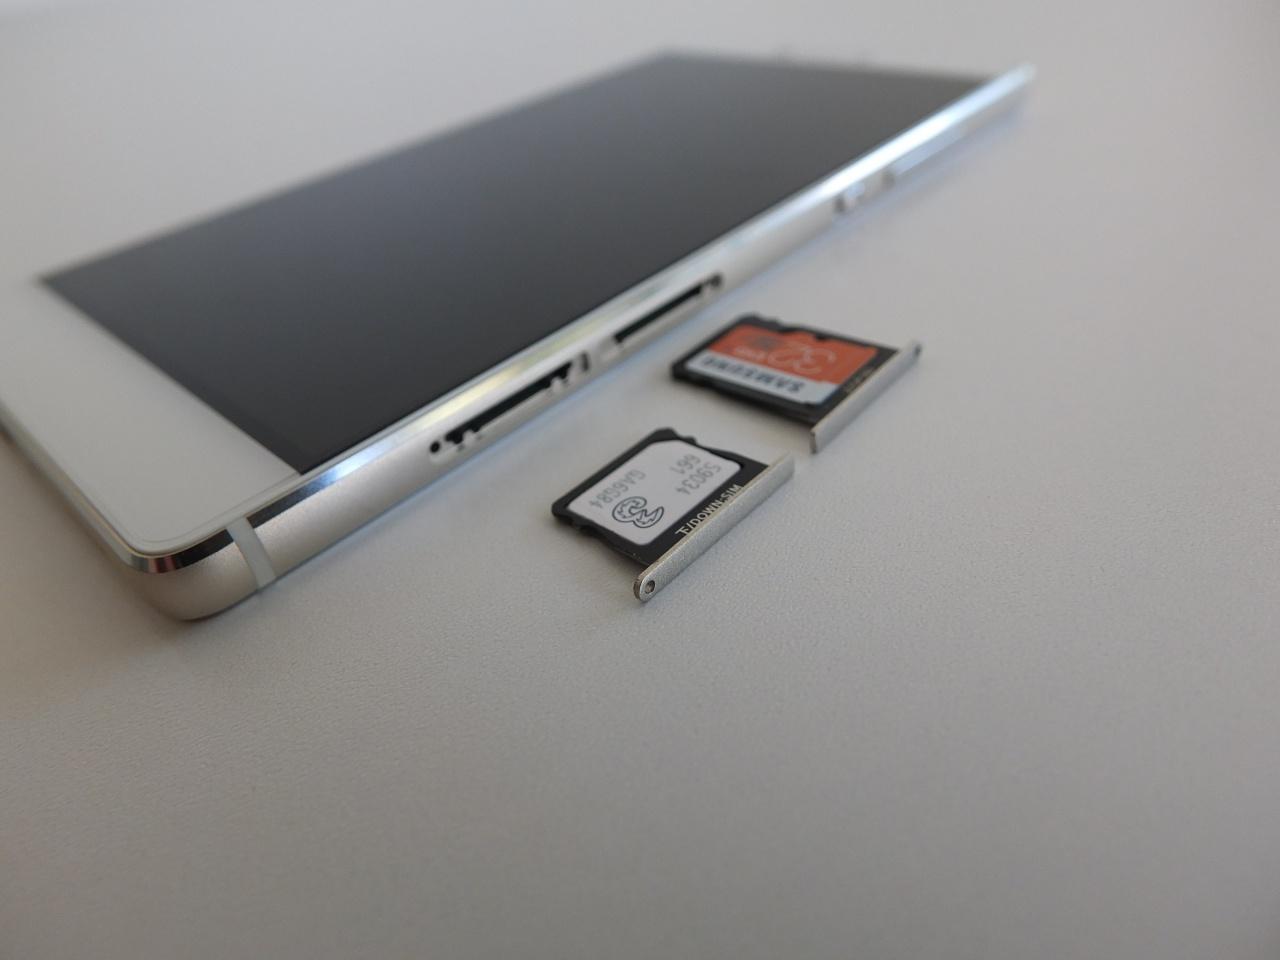 Huawei p8 lite memory card